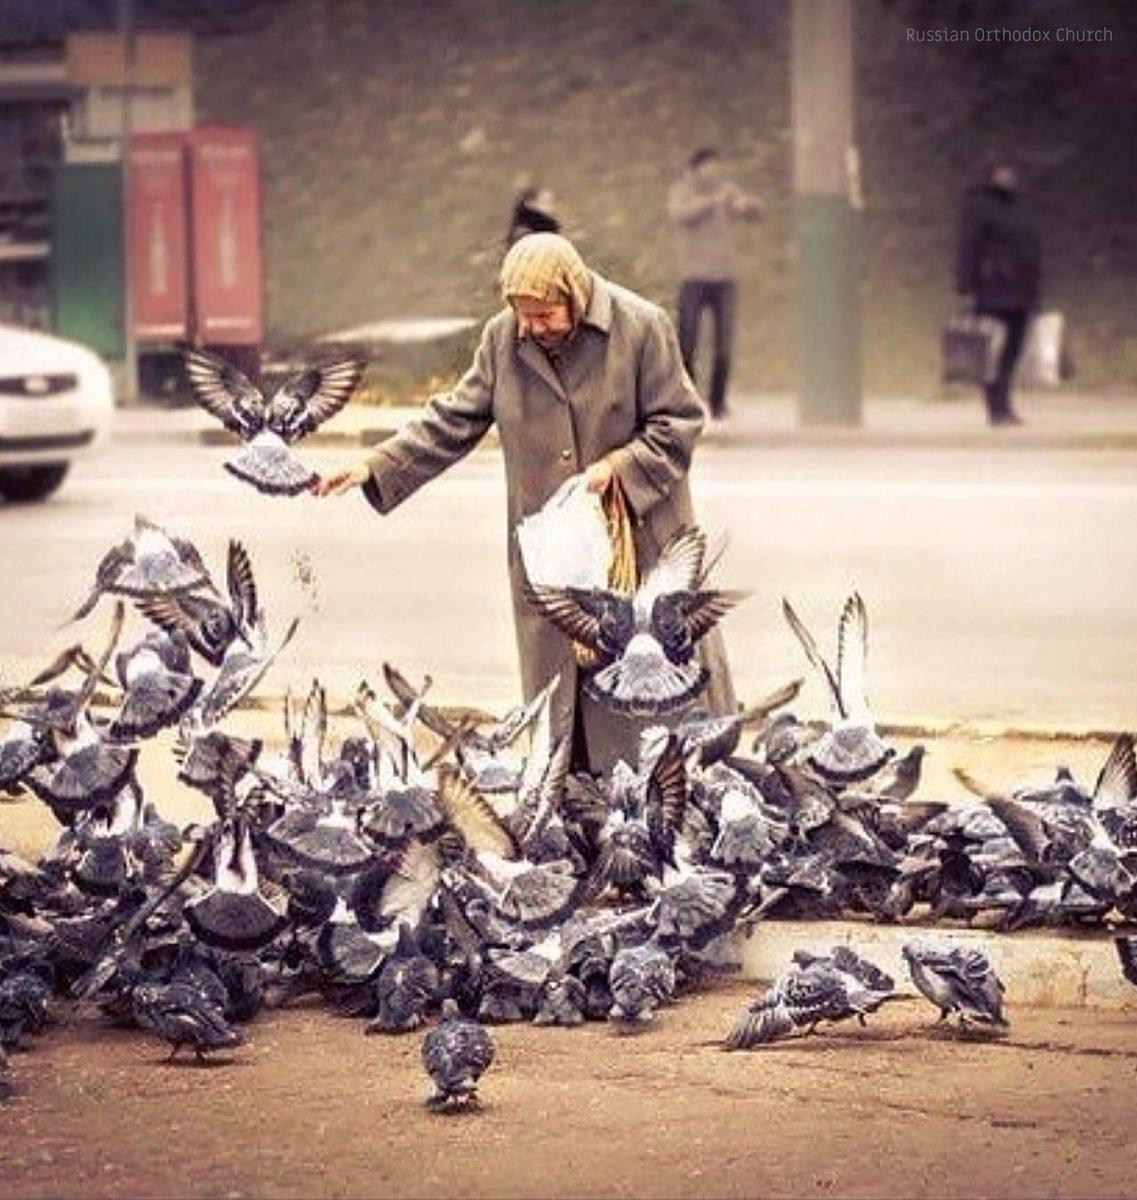 мопса, картинки старушка кормит голубей архитекторов